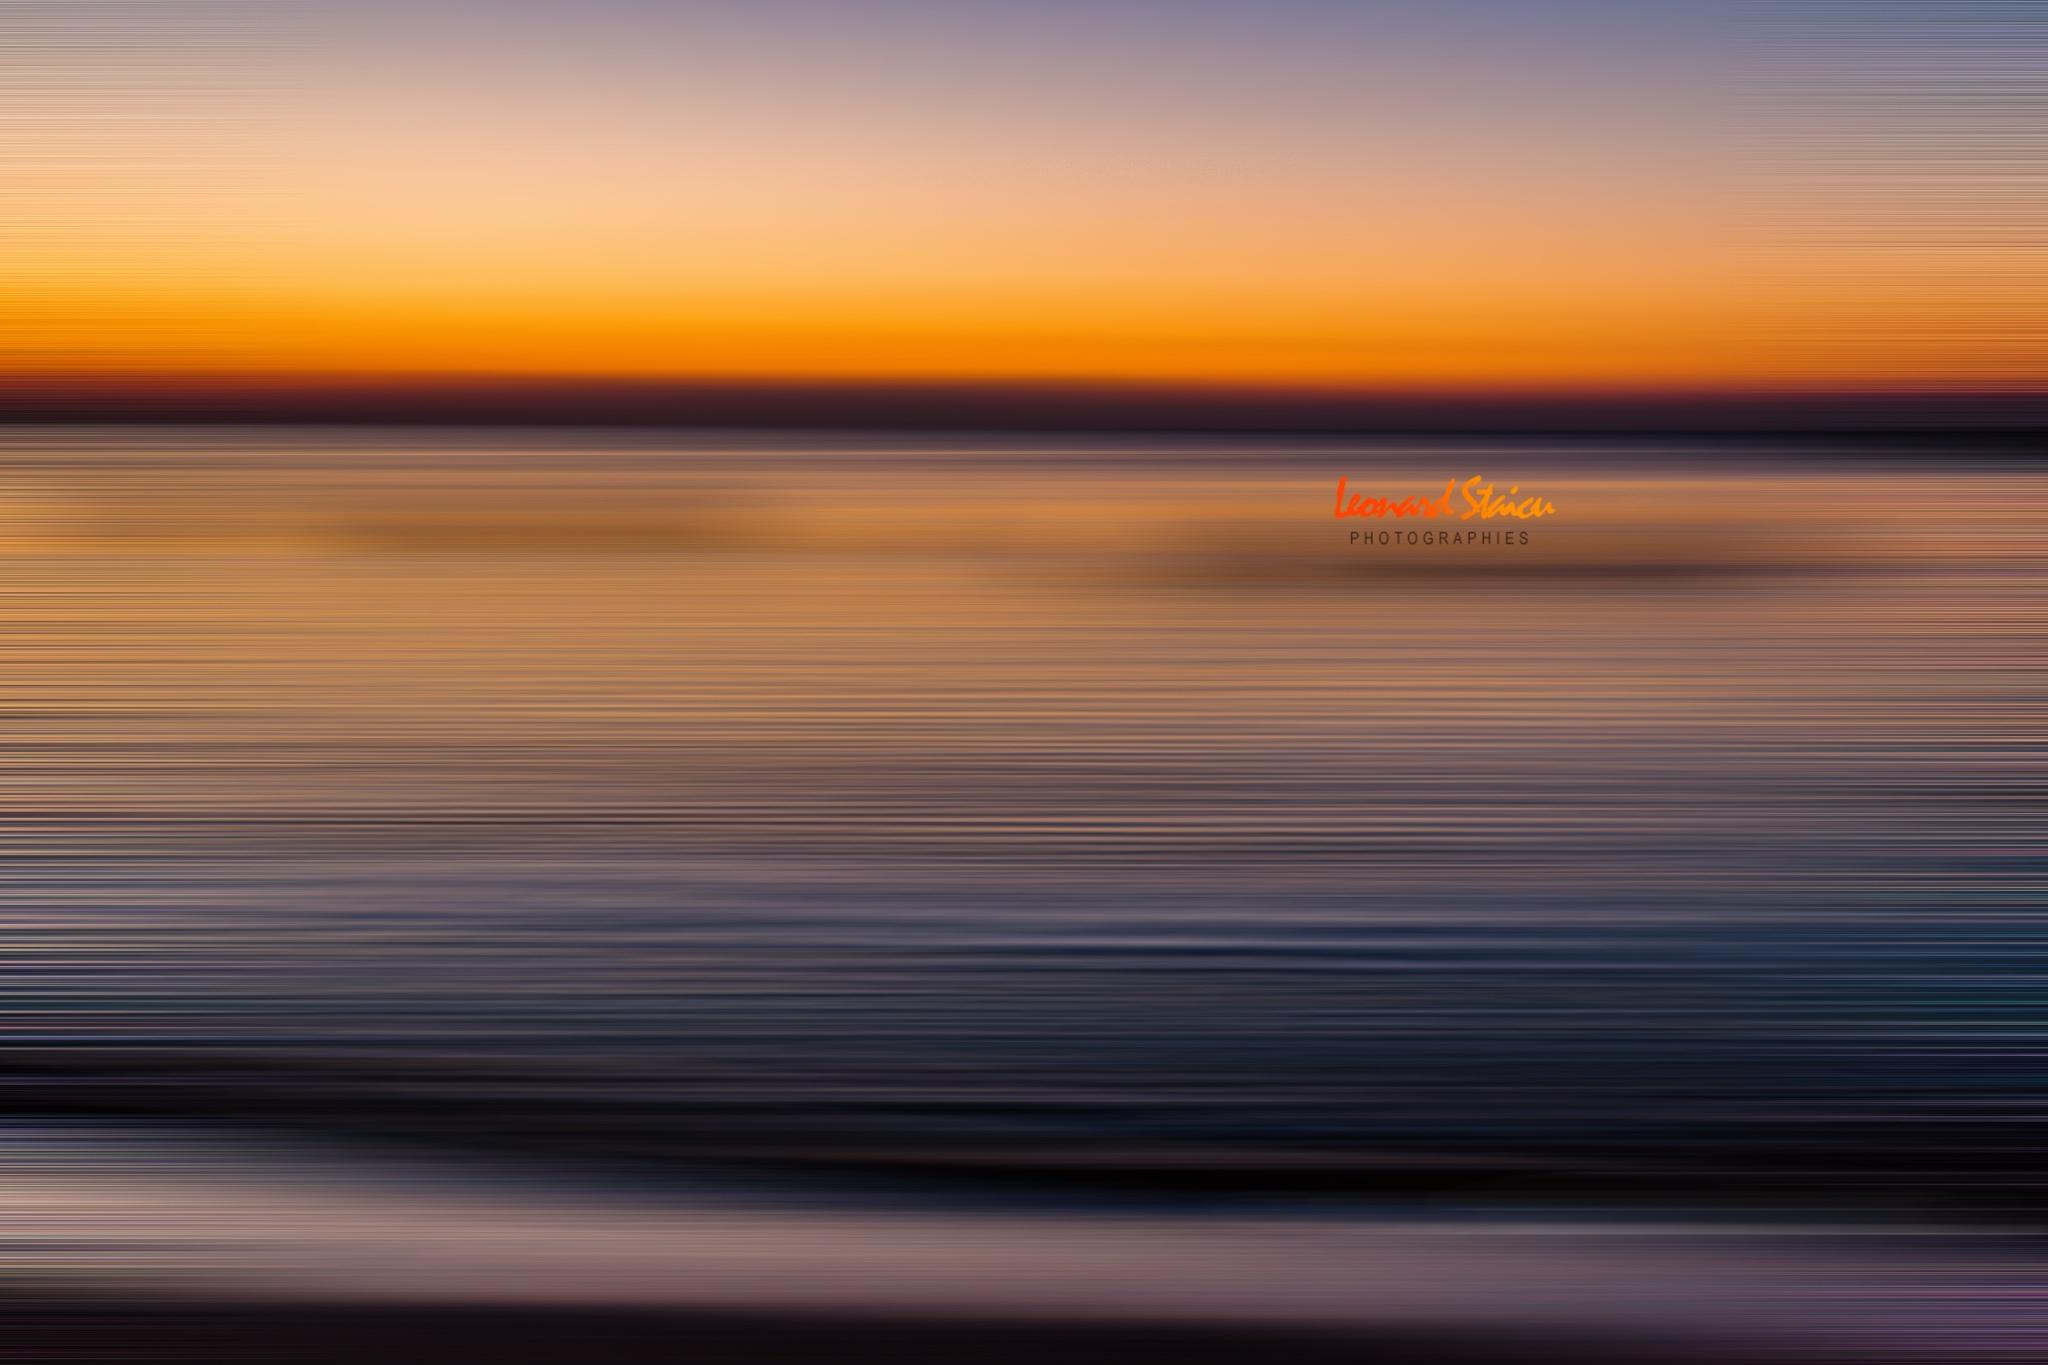 Romanian black sea by Leo